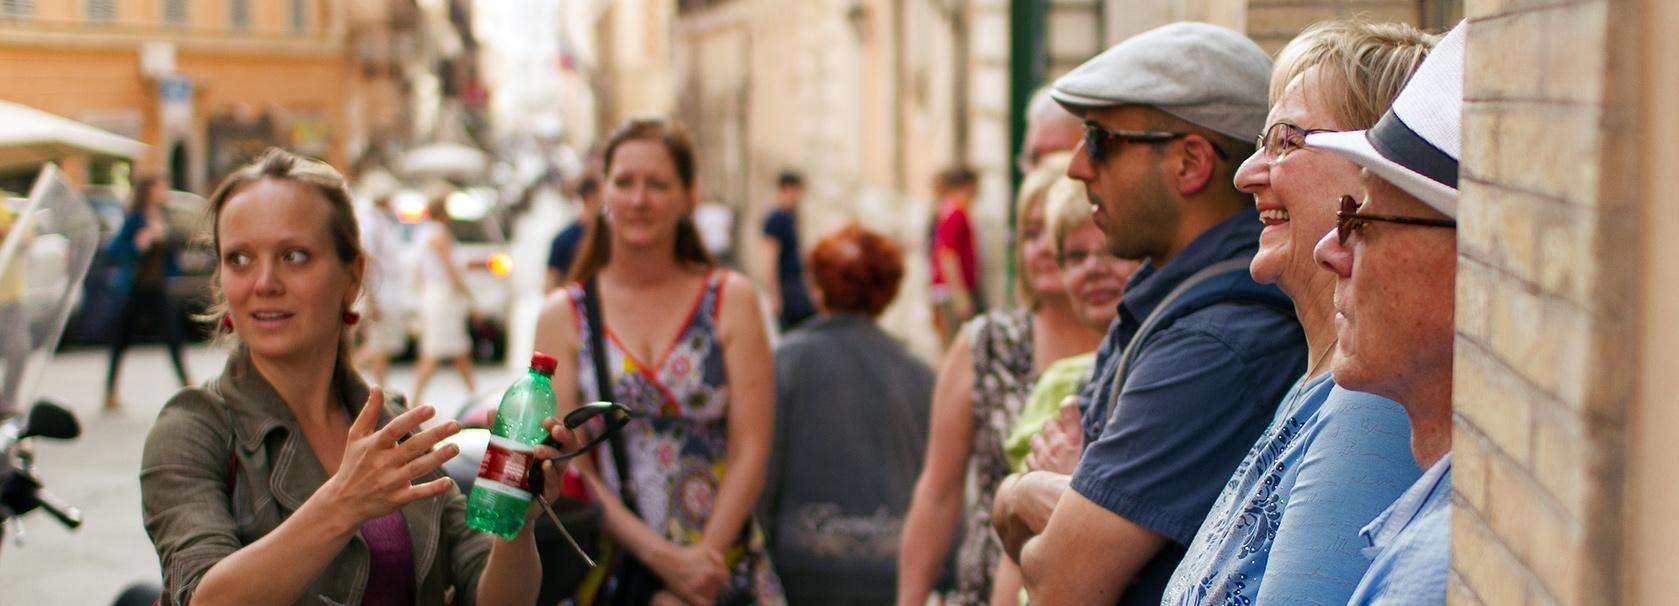 Rome: Twilight Walking Tour and Gelato Tasting